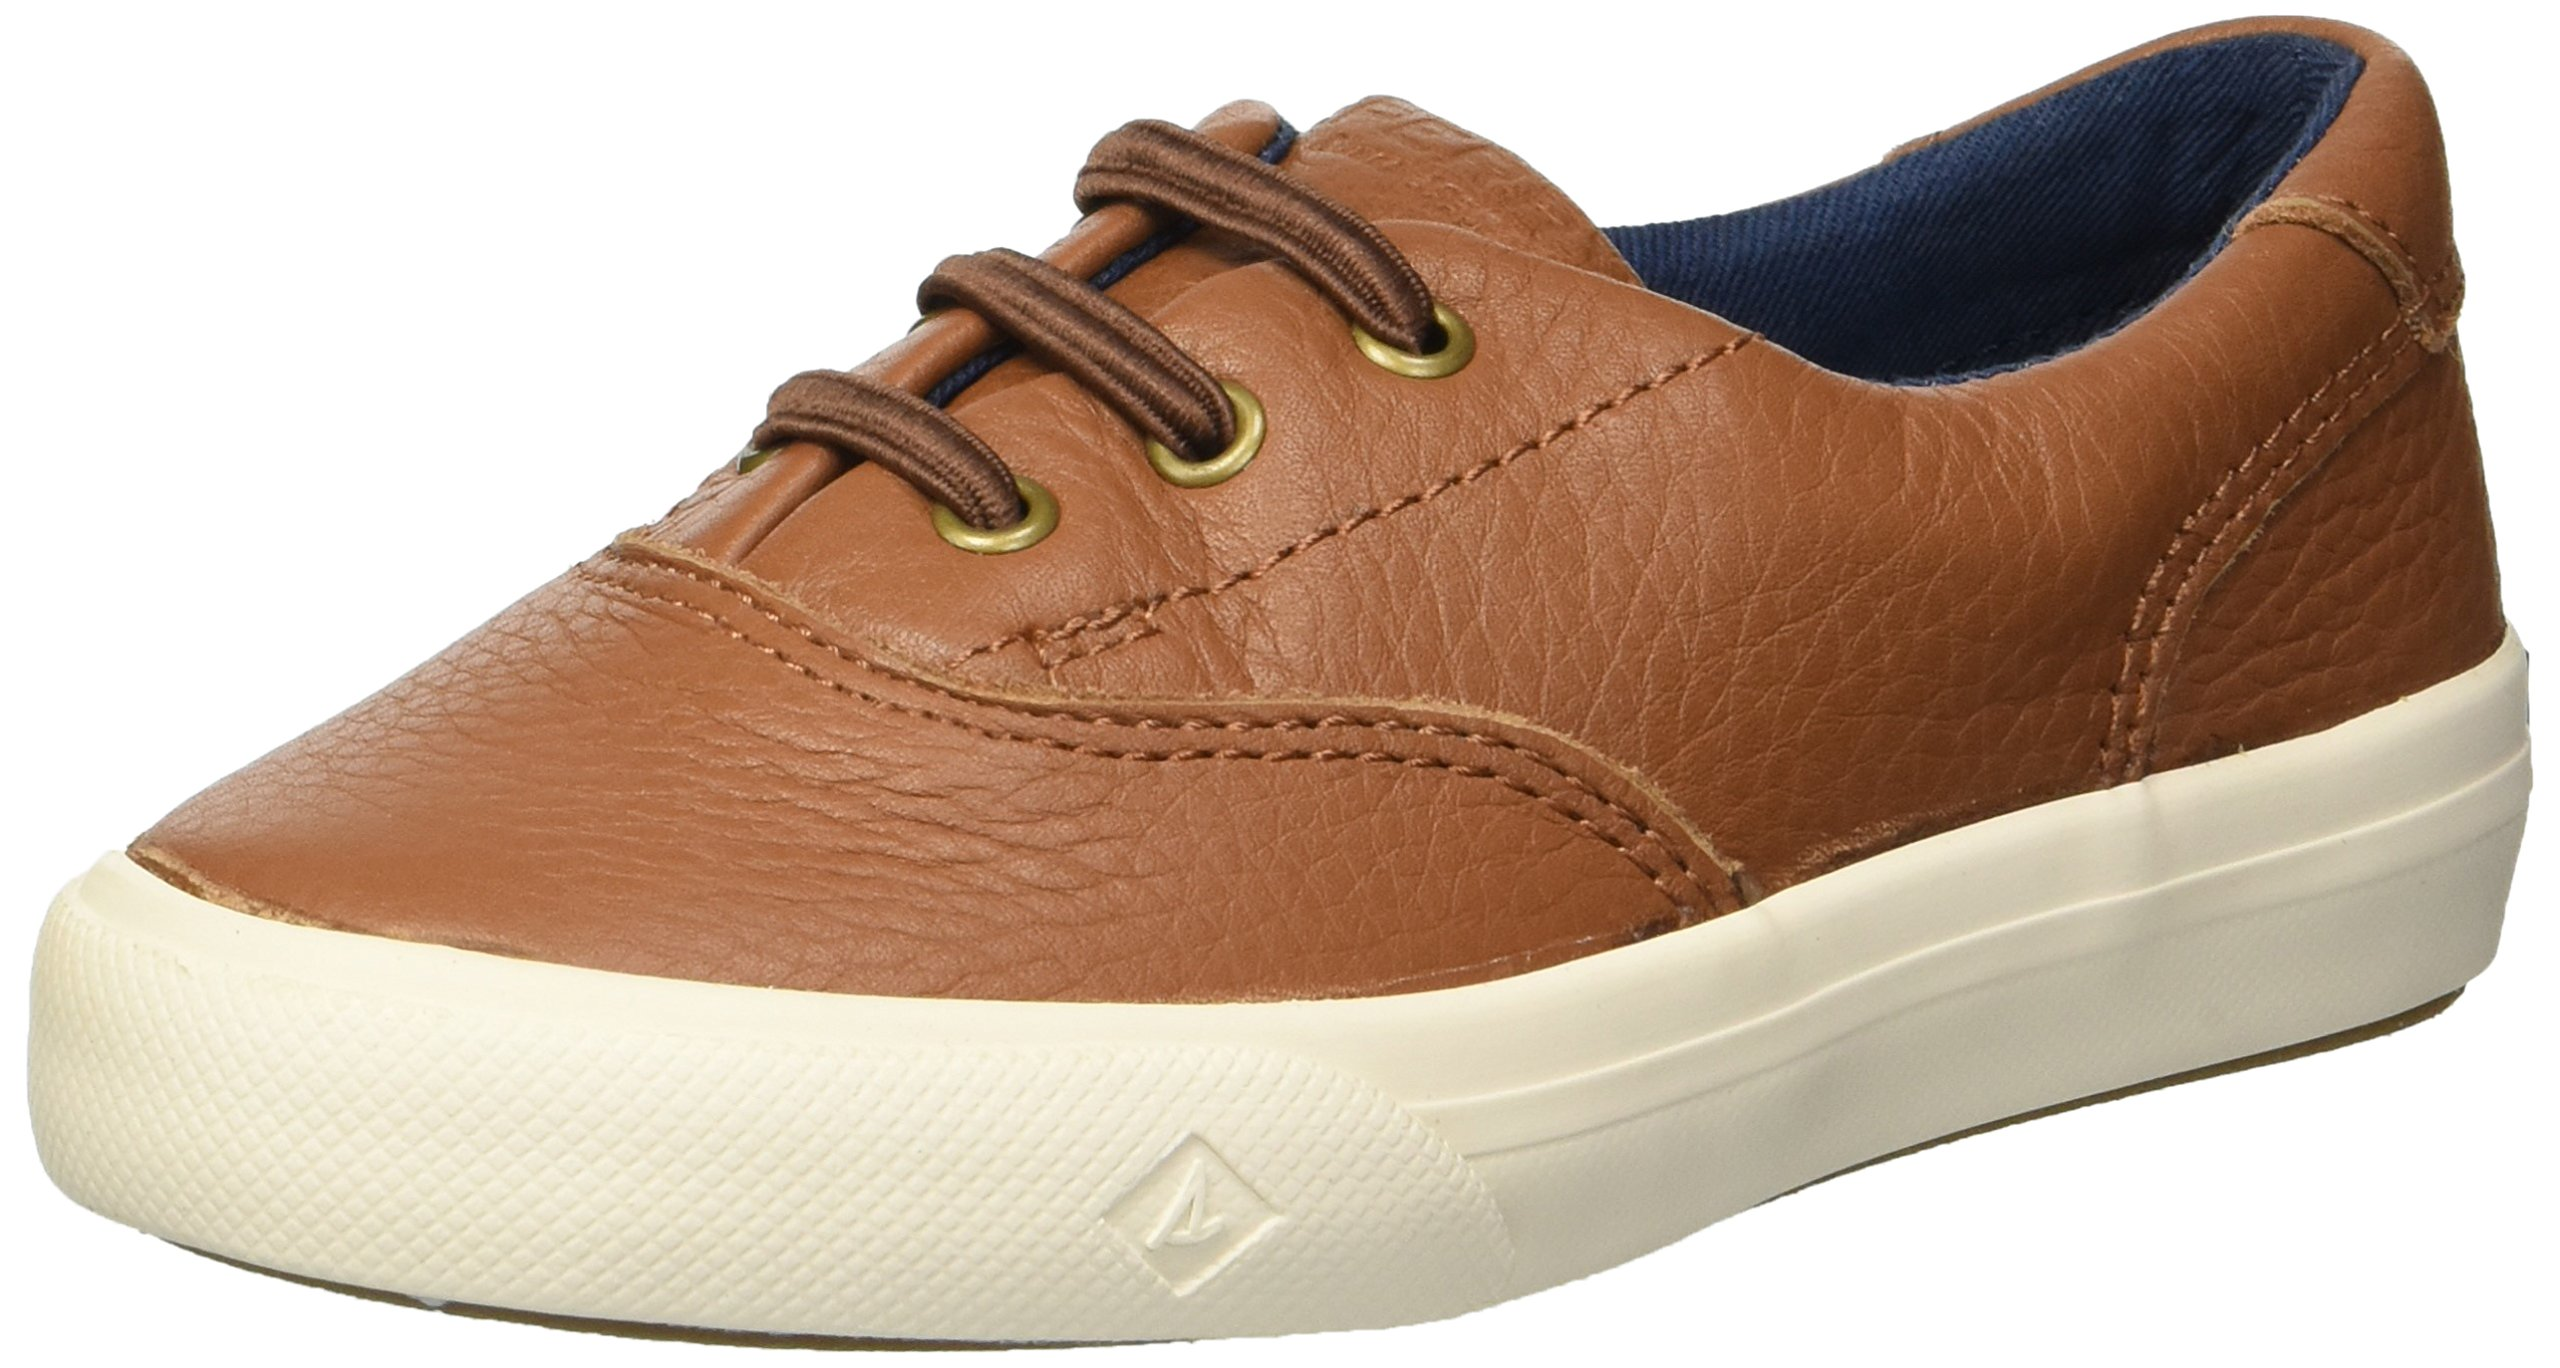 SPERRY Boys' Striper II Jr Leather Boat Shoe, tan, 10 Medium US Toddler by SPERRY